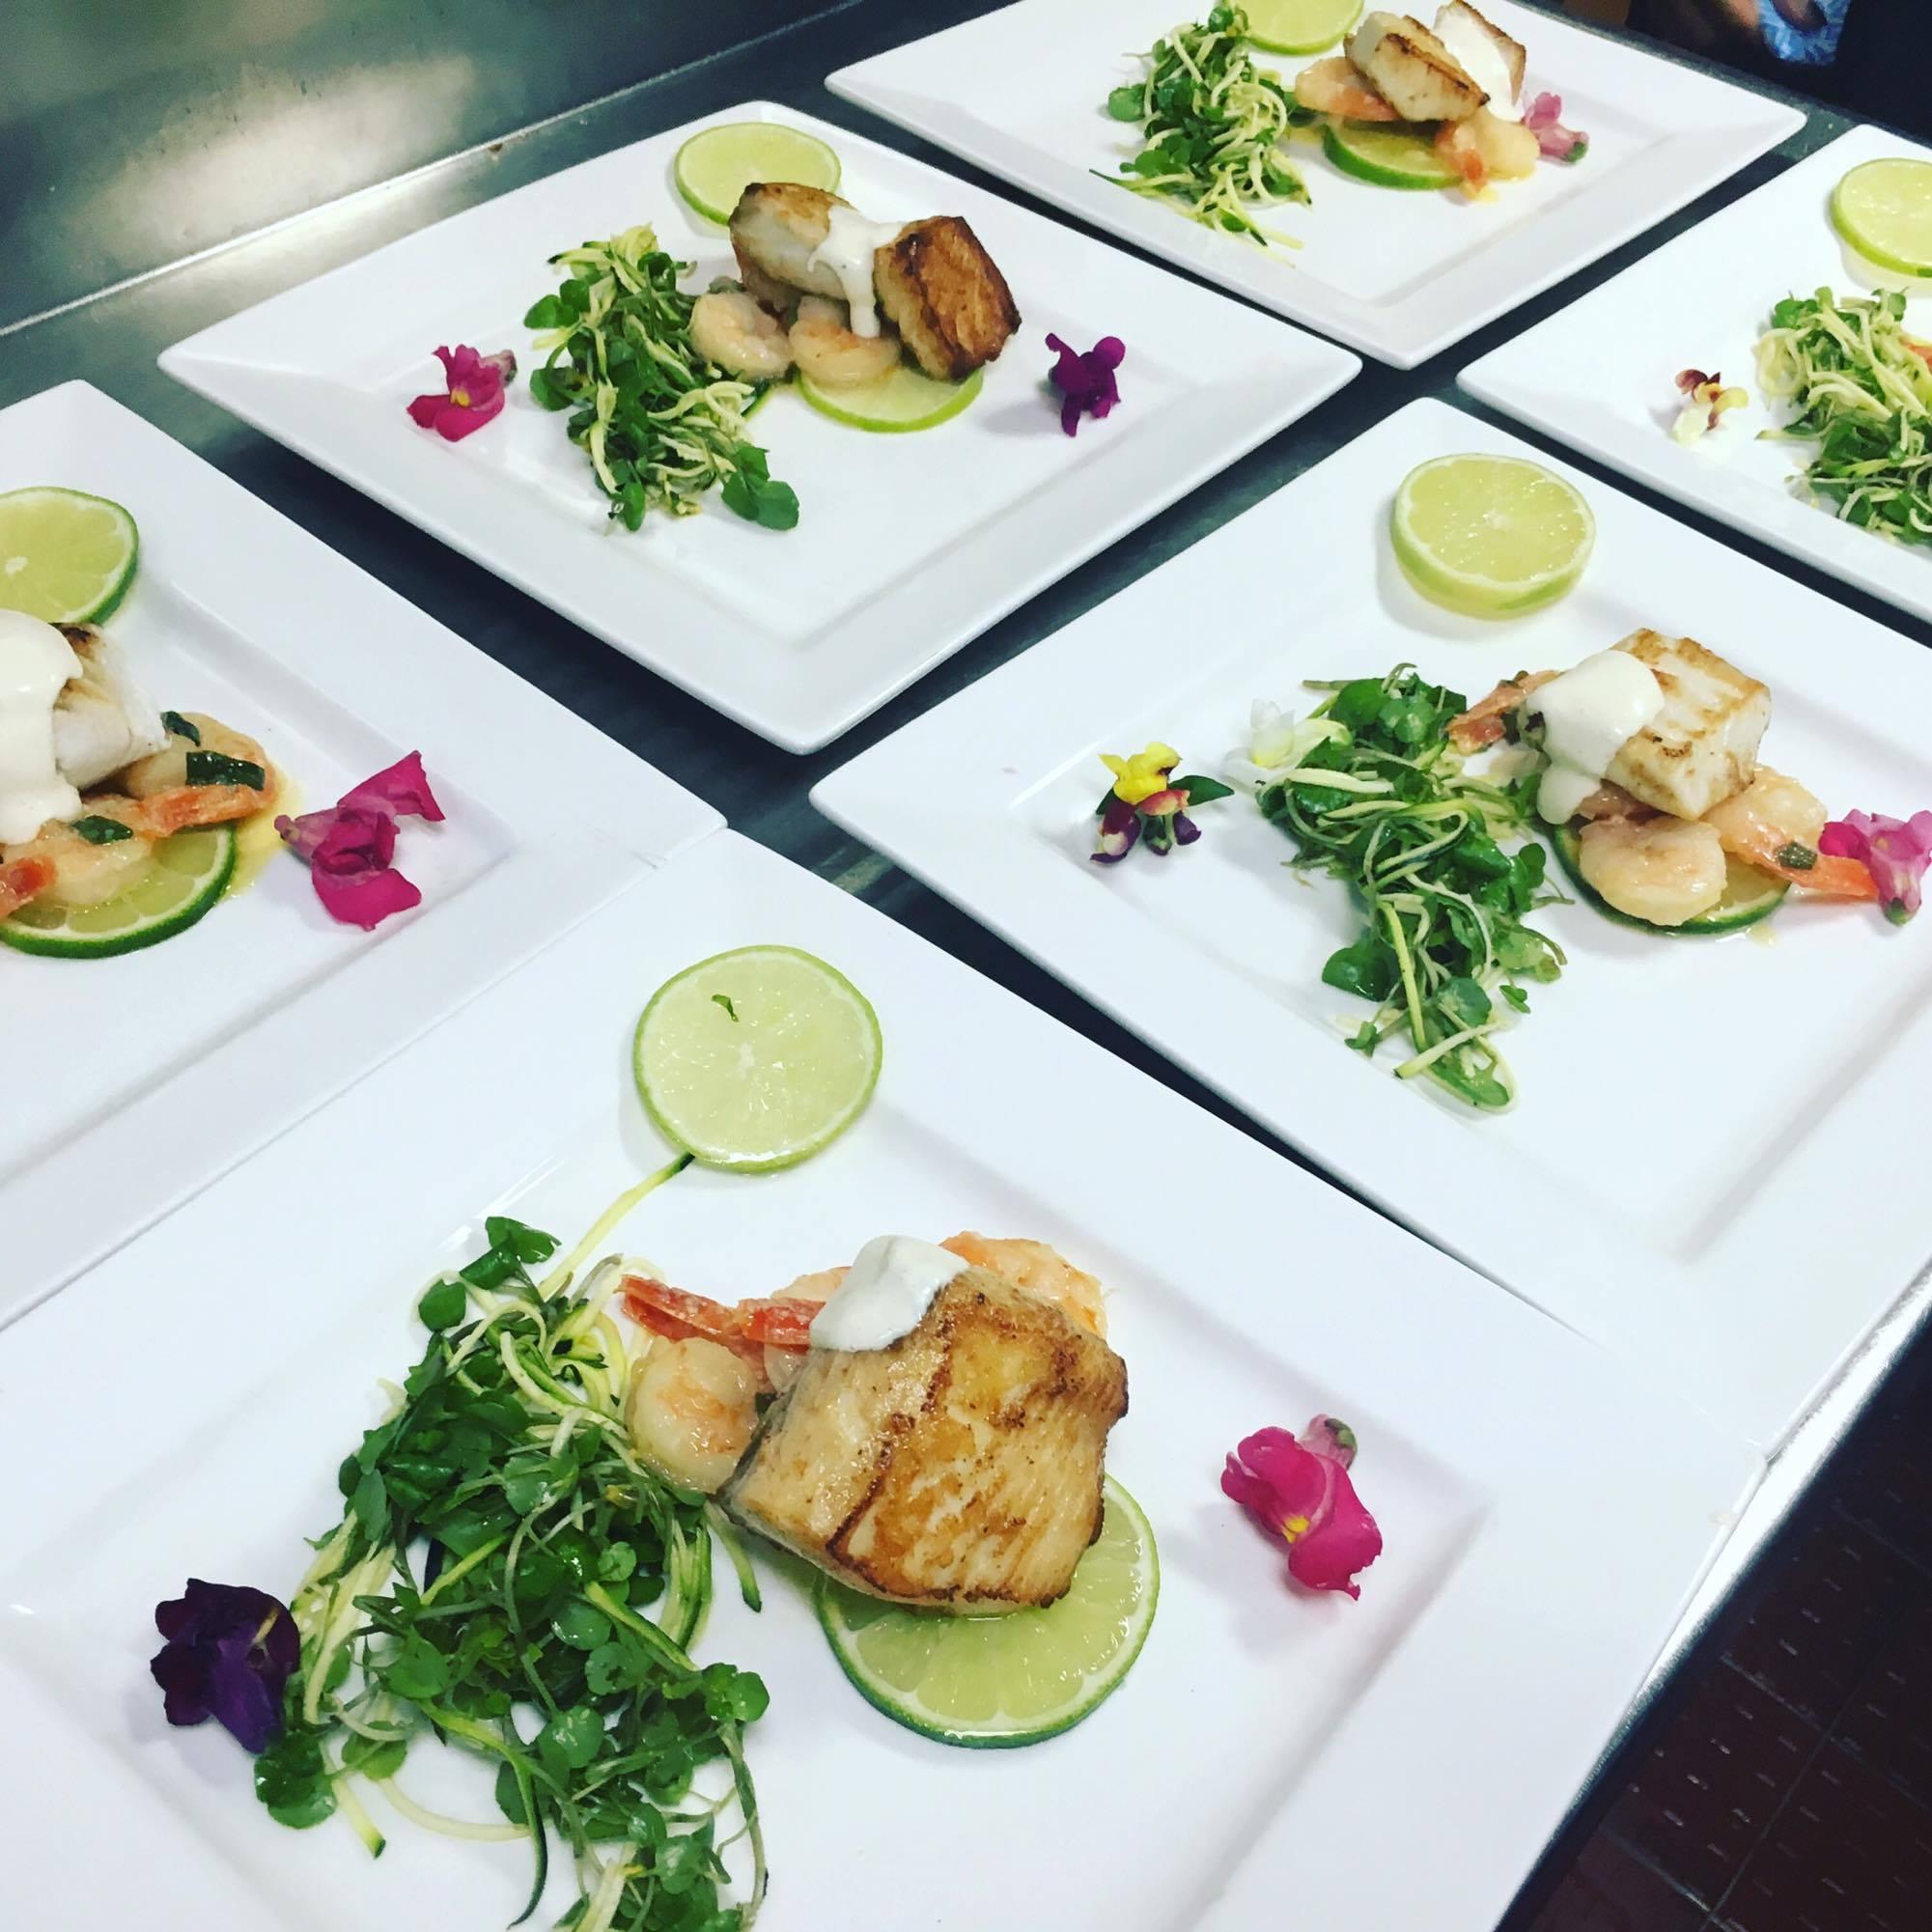 Chef prepared, gourmet meals served onboard Reef Encounter